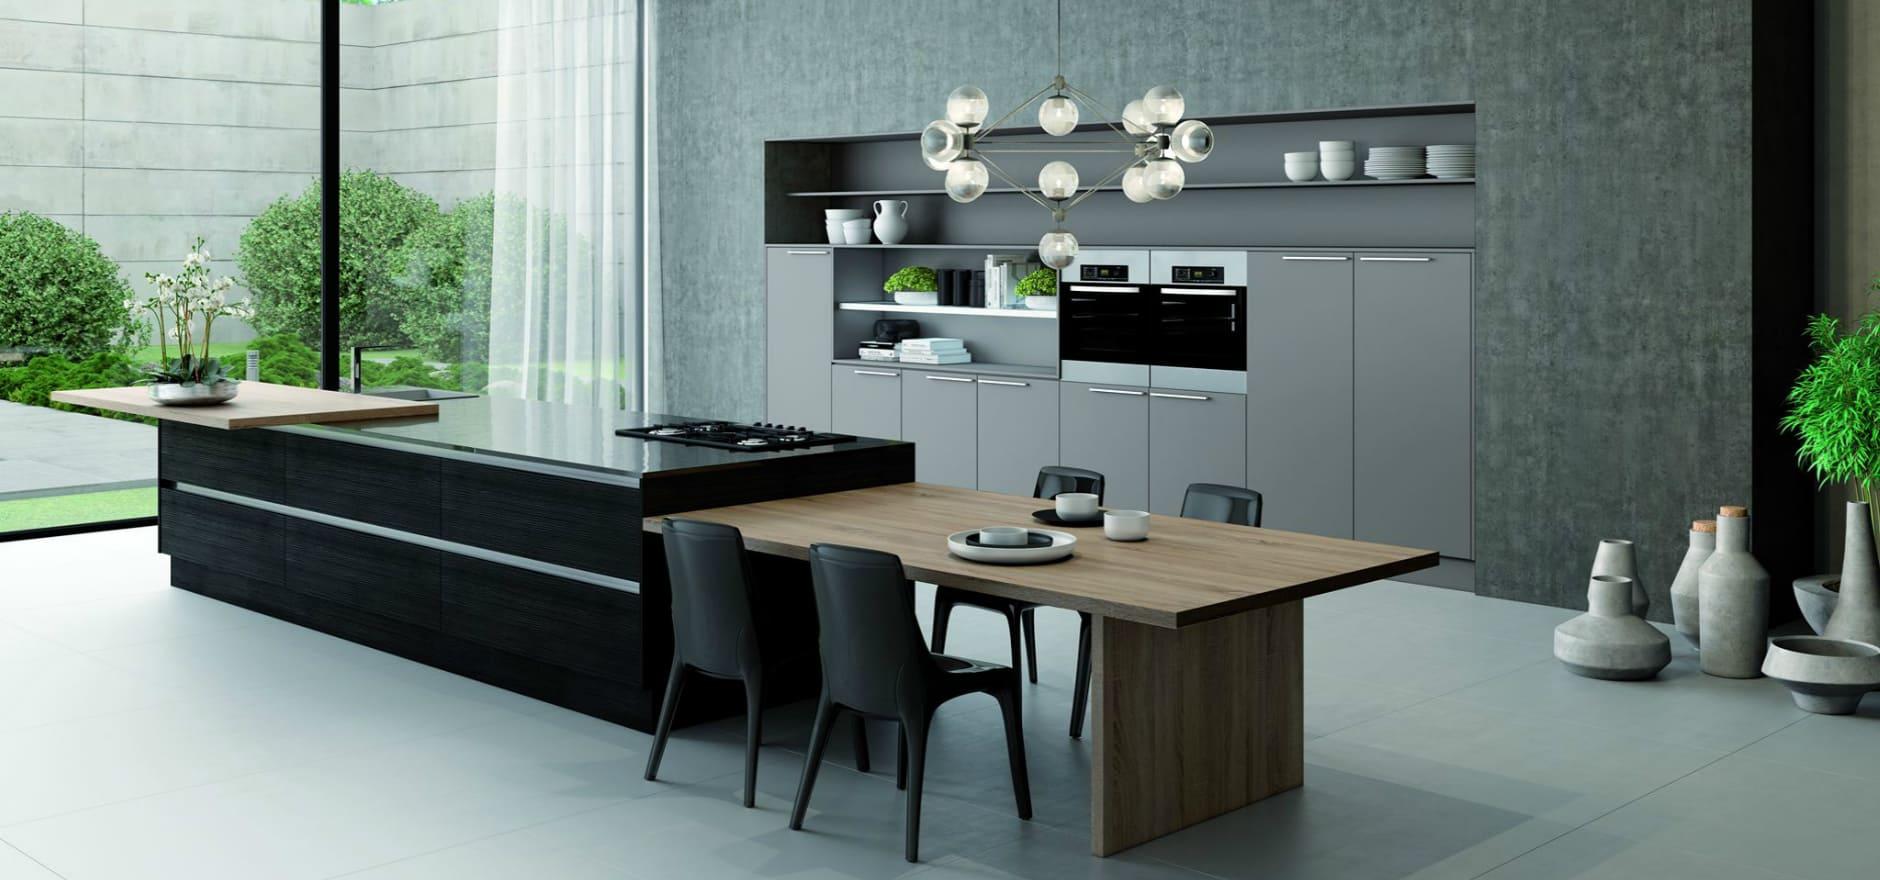 Cozinha Dell Anno Externa 1